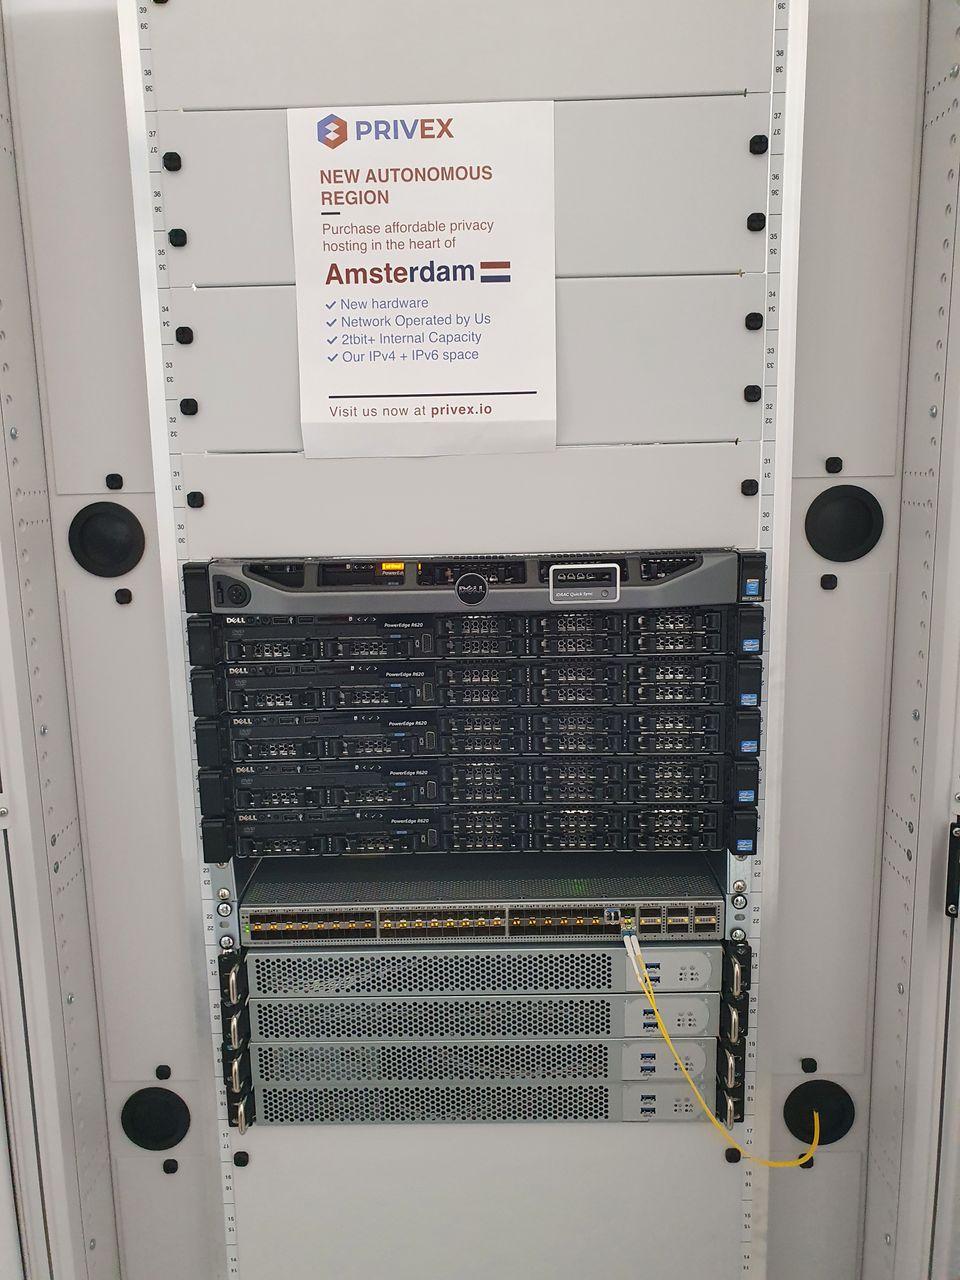 Photo of Privex's server rack in Amsterdam, Netherlands